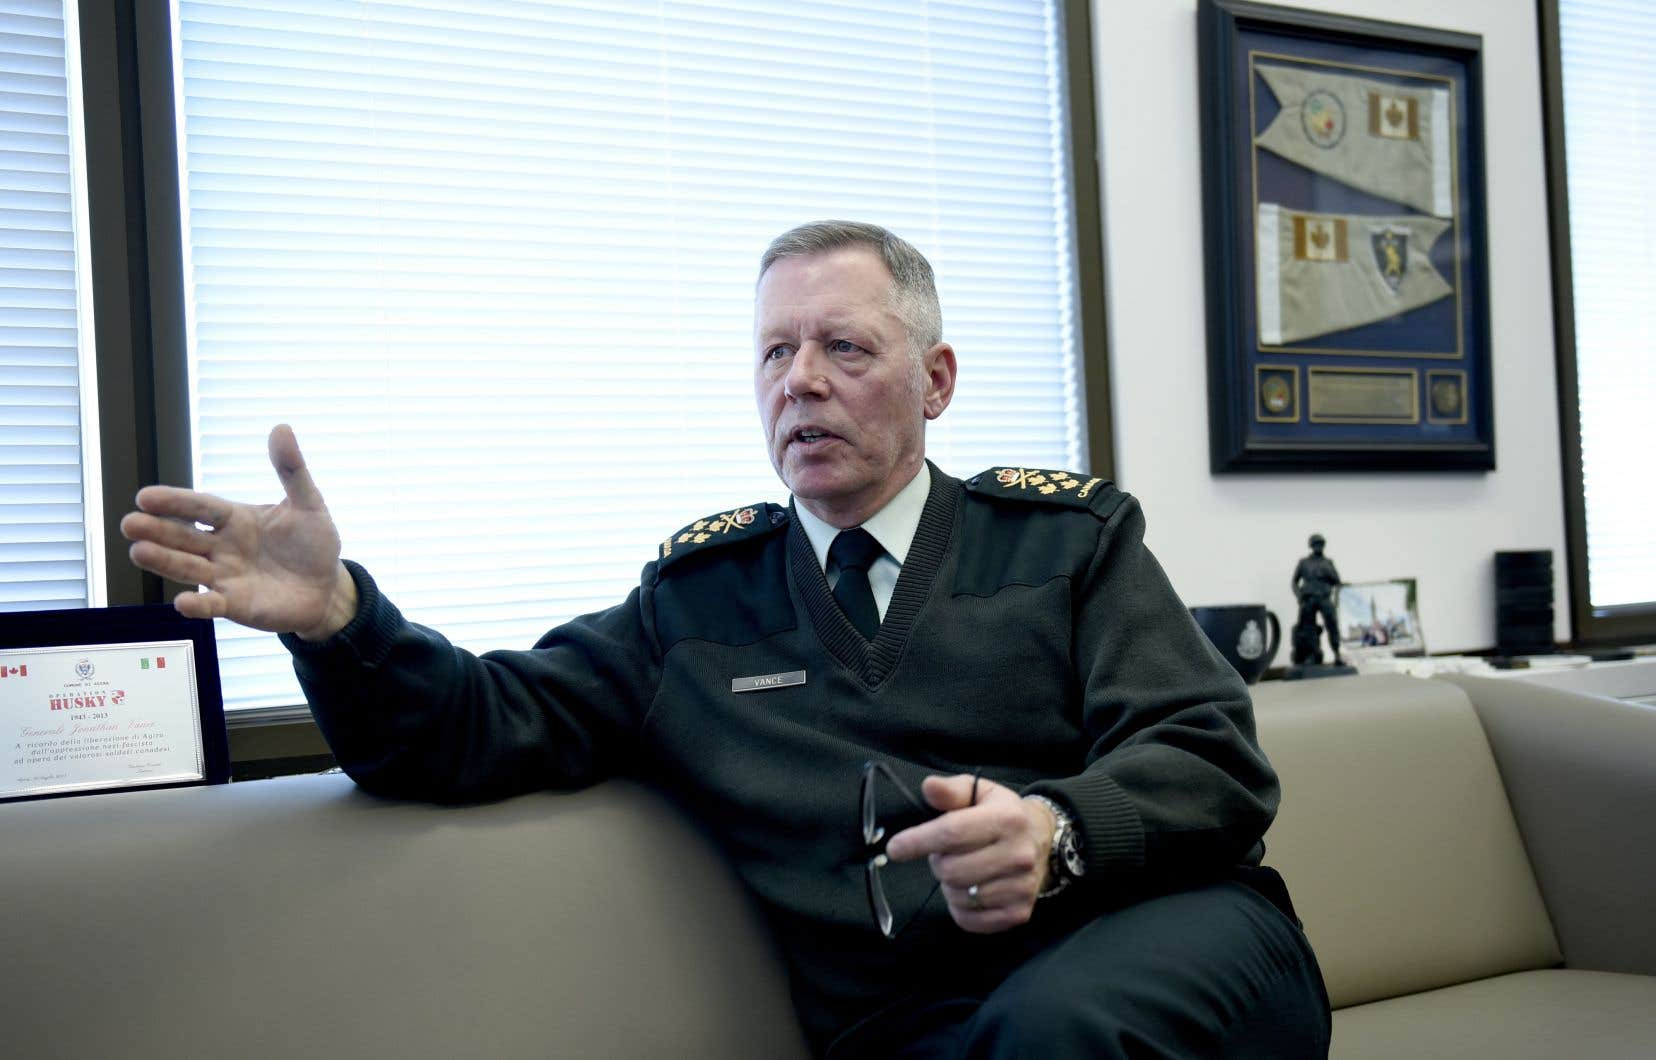 Le chef d'état-major de la Défense du Canada, Jonathan Vance